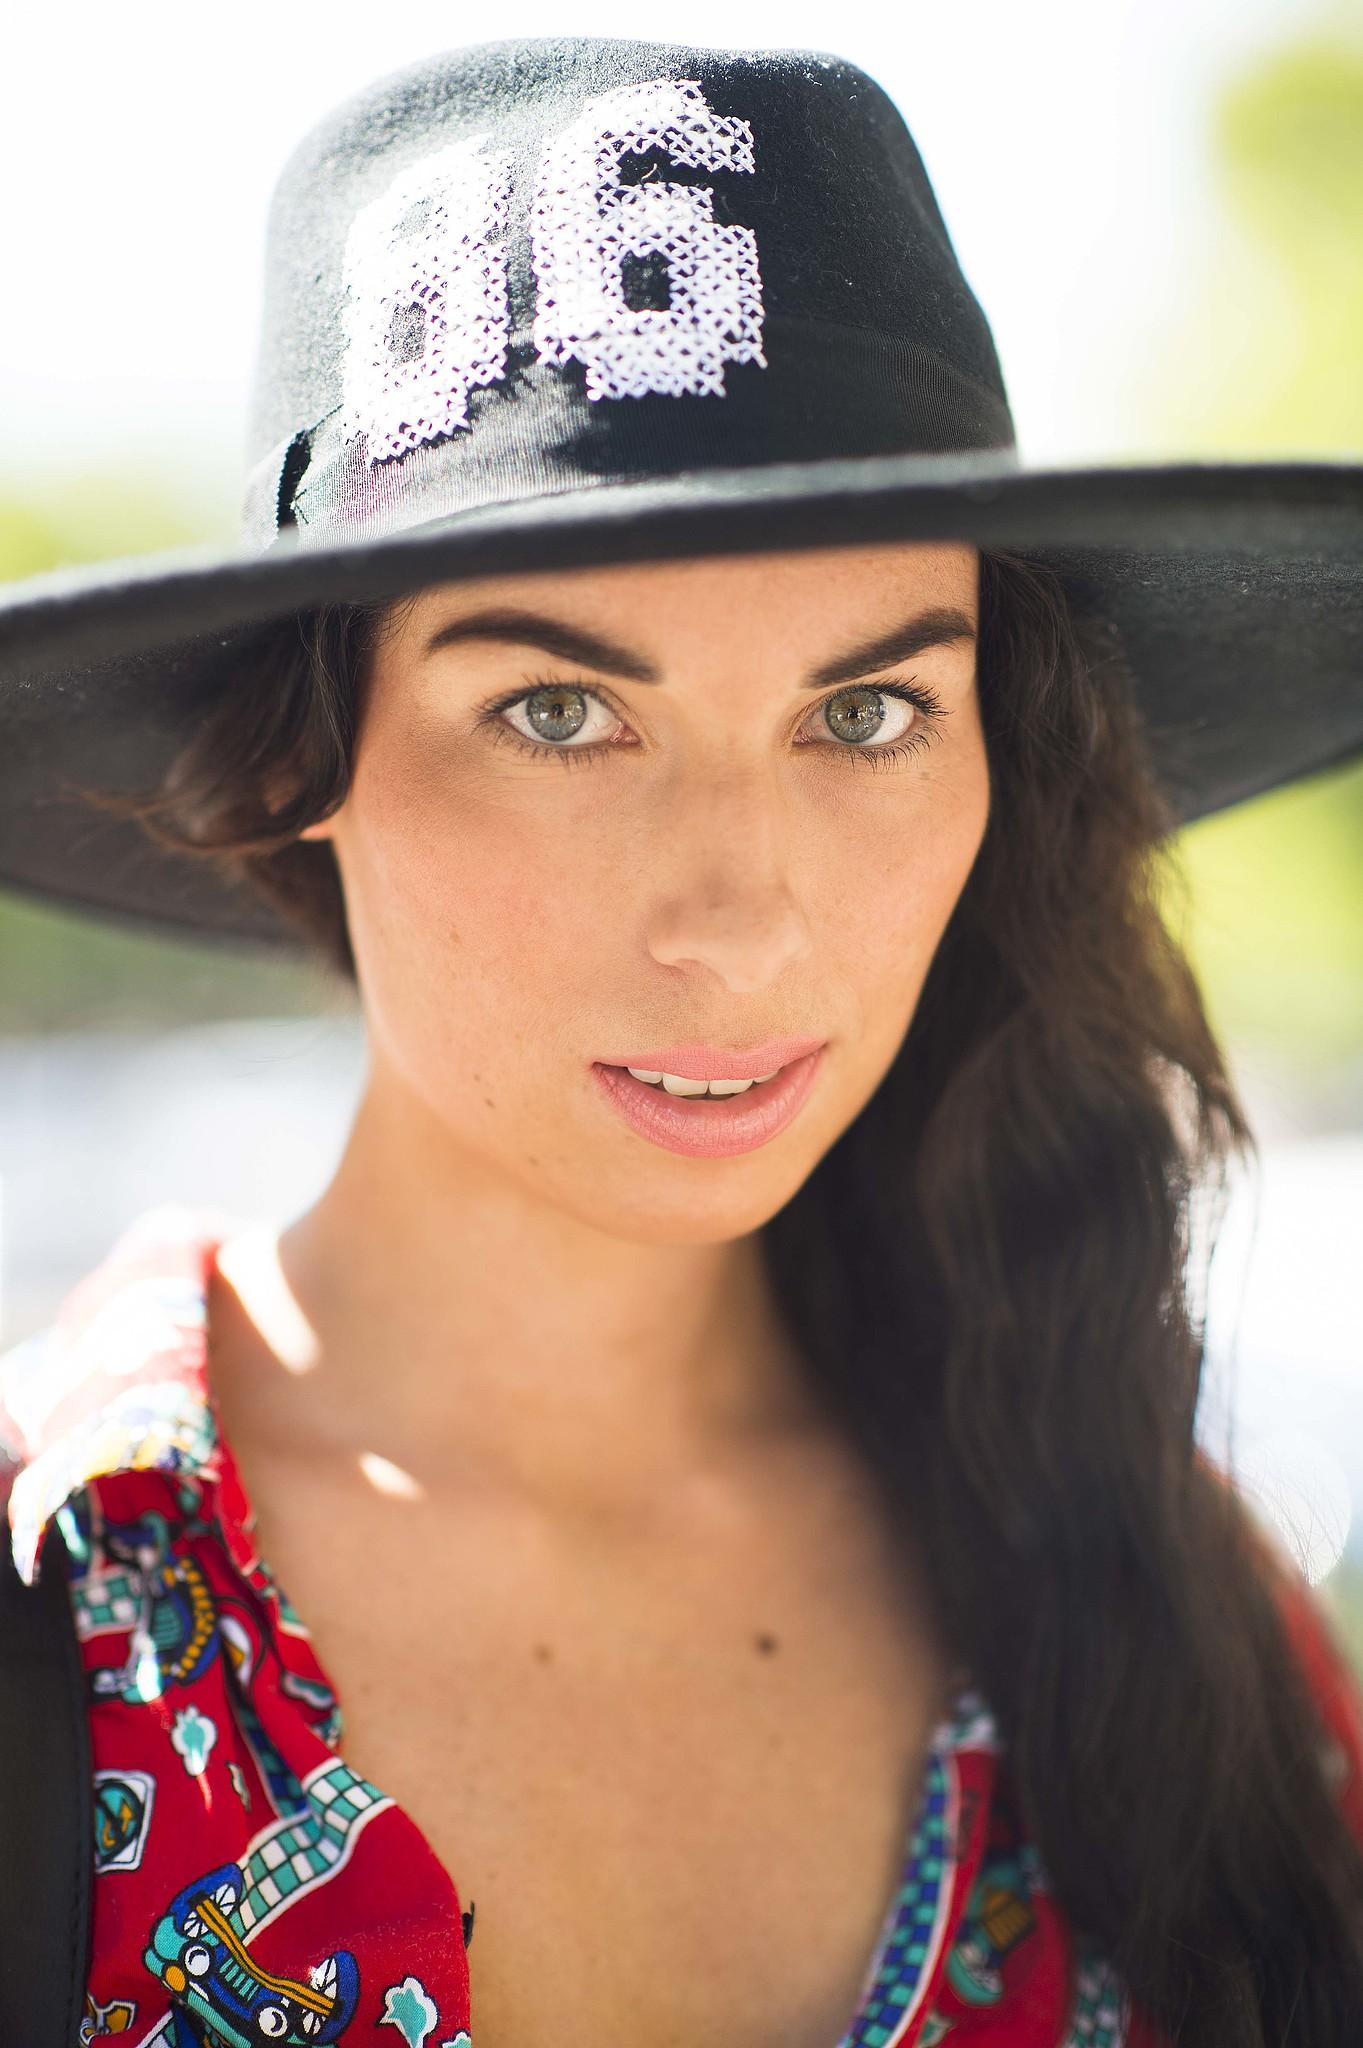 When in doubt, throw on a wide-brimmed cap.  Source: Le 21ème | Adam Katz Sinding